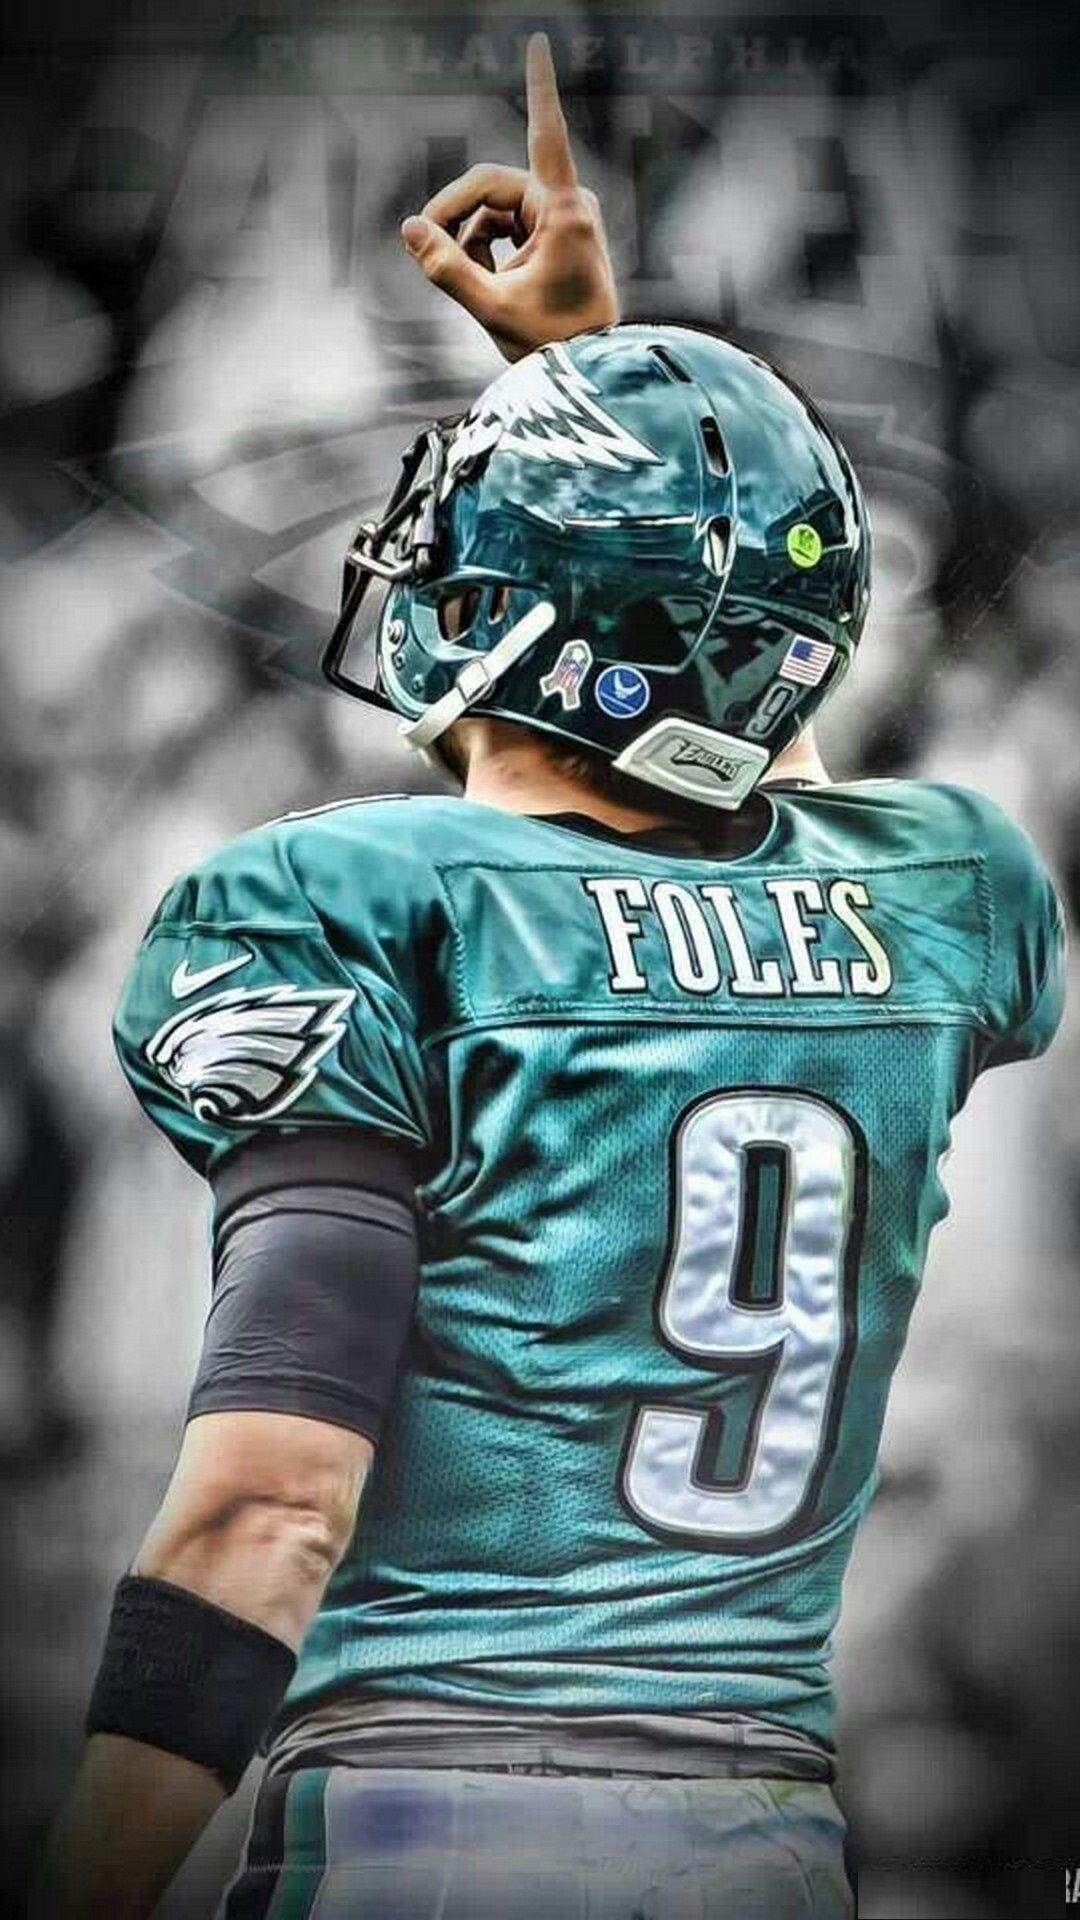 Nfl Sick Football Wallpaper Android Download Philadelphia Eagles Super Bowl Philadelphia Eagles Football Philadelphia Sports